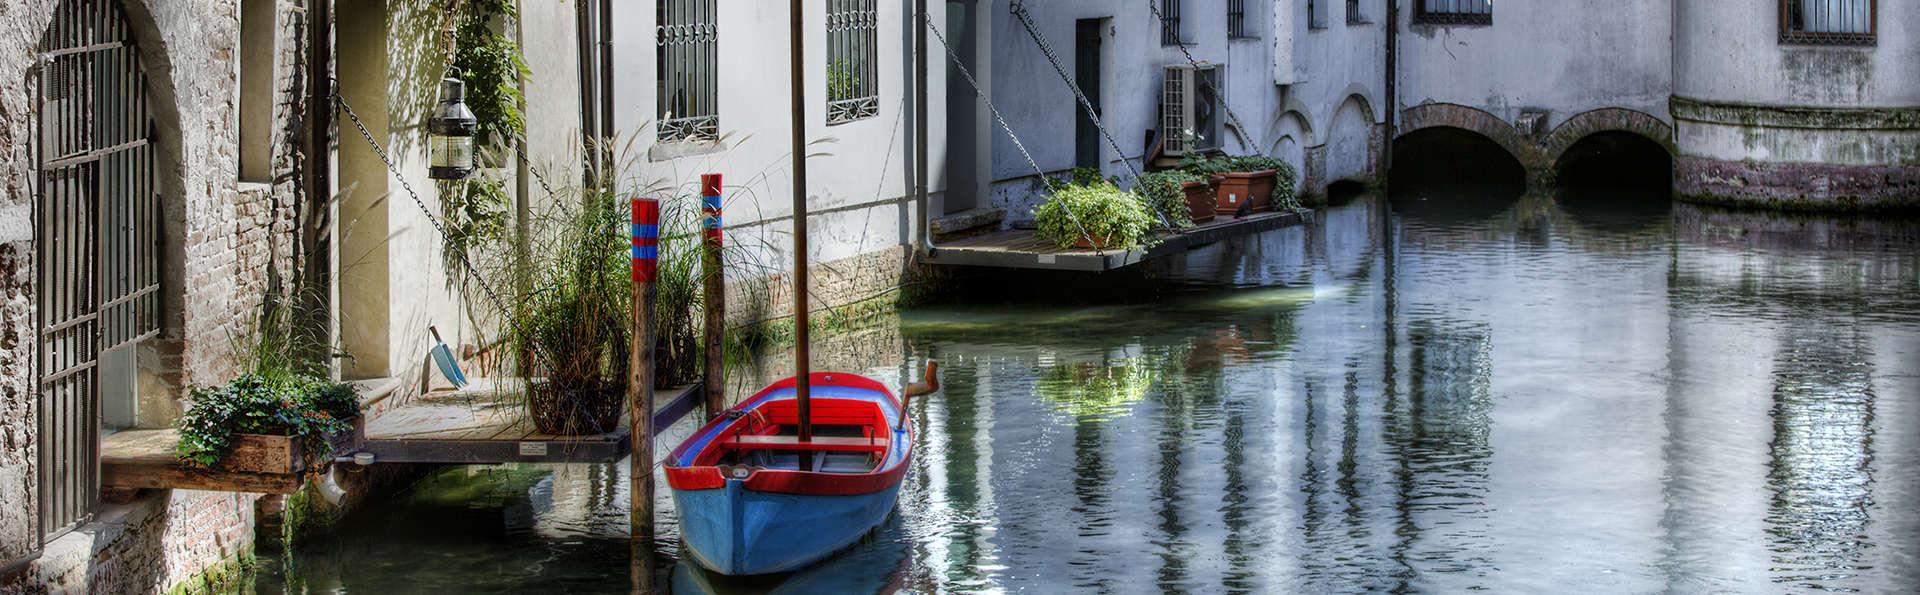 Best Western Premier BHR Treviso Hotel - Edit_Treviso2.jpg